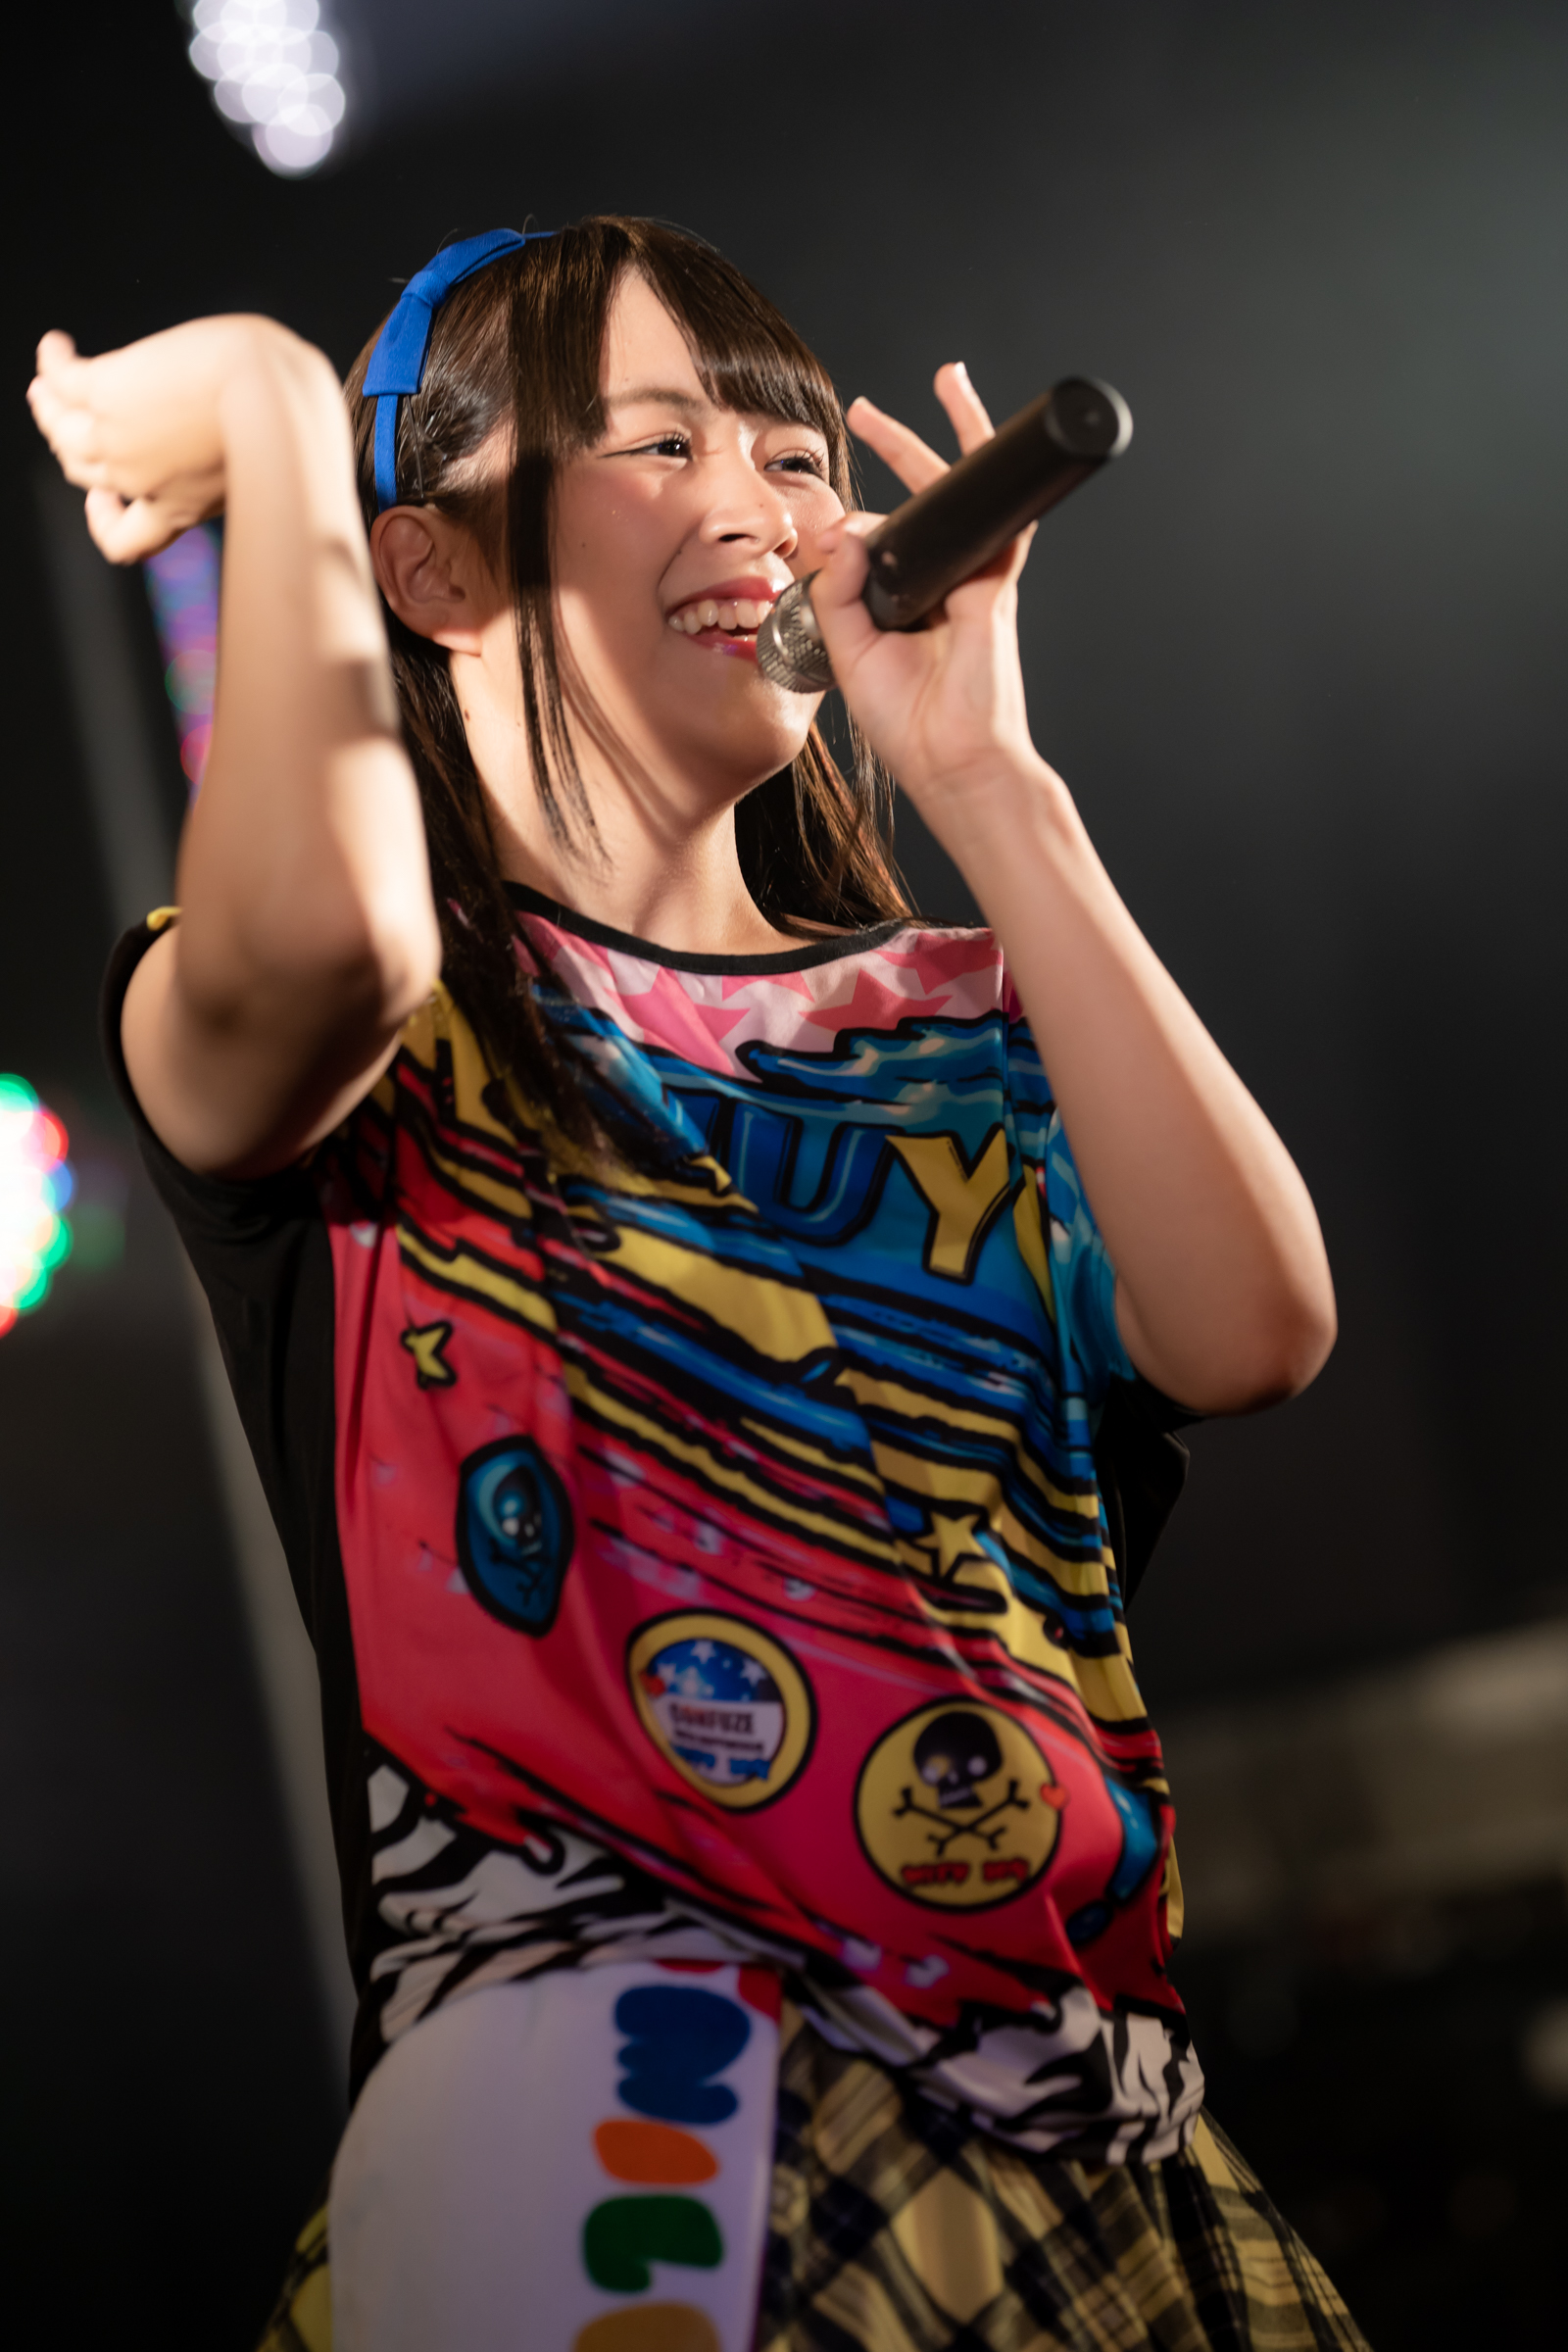 POPPING☆SMILE あいり ( 永山愛梨 ) | フルーティー定期公演フルーツバスケット~おまる生誕~